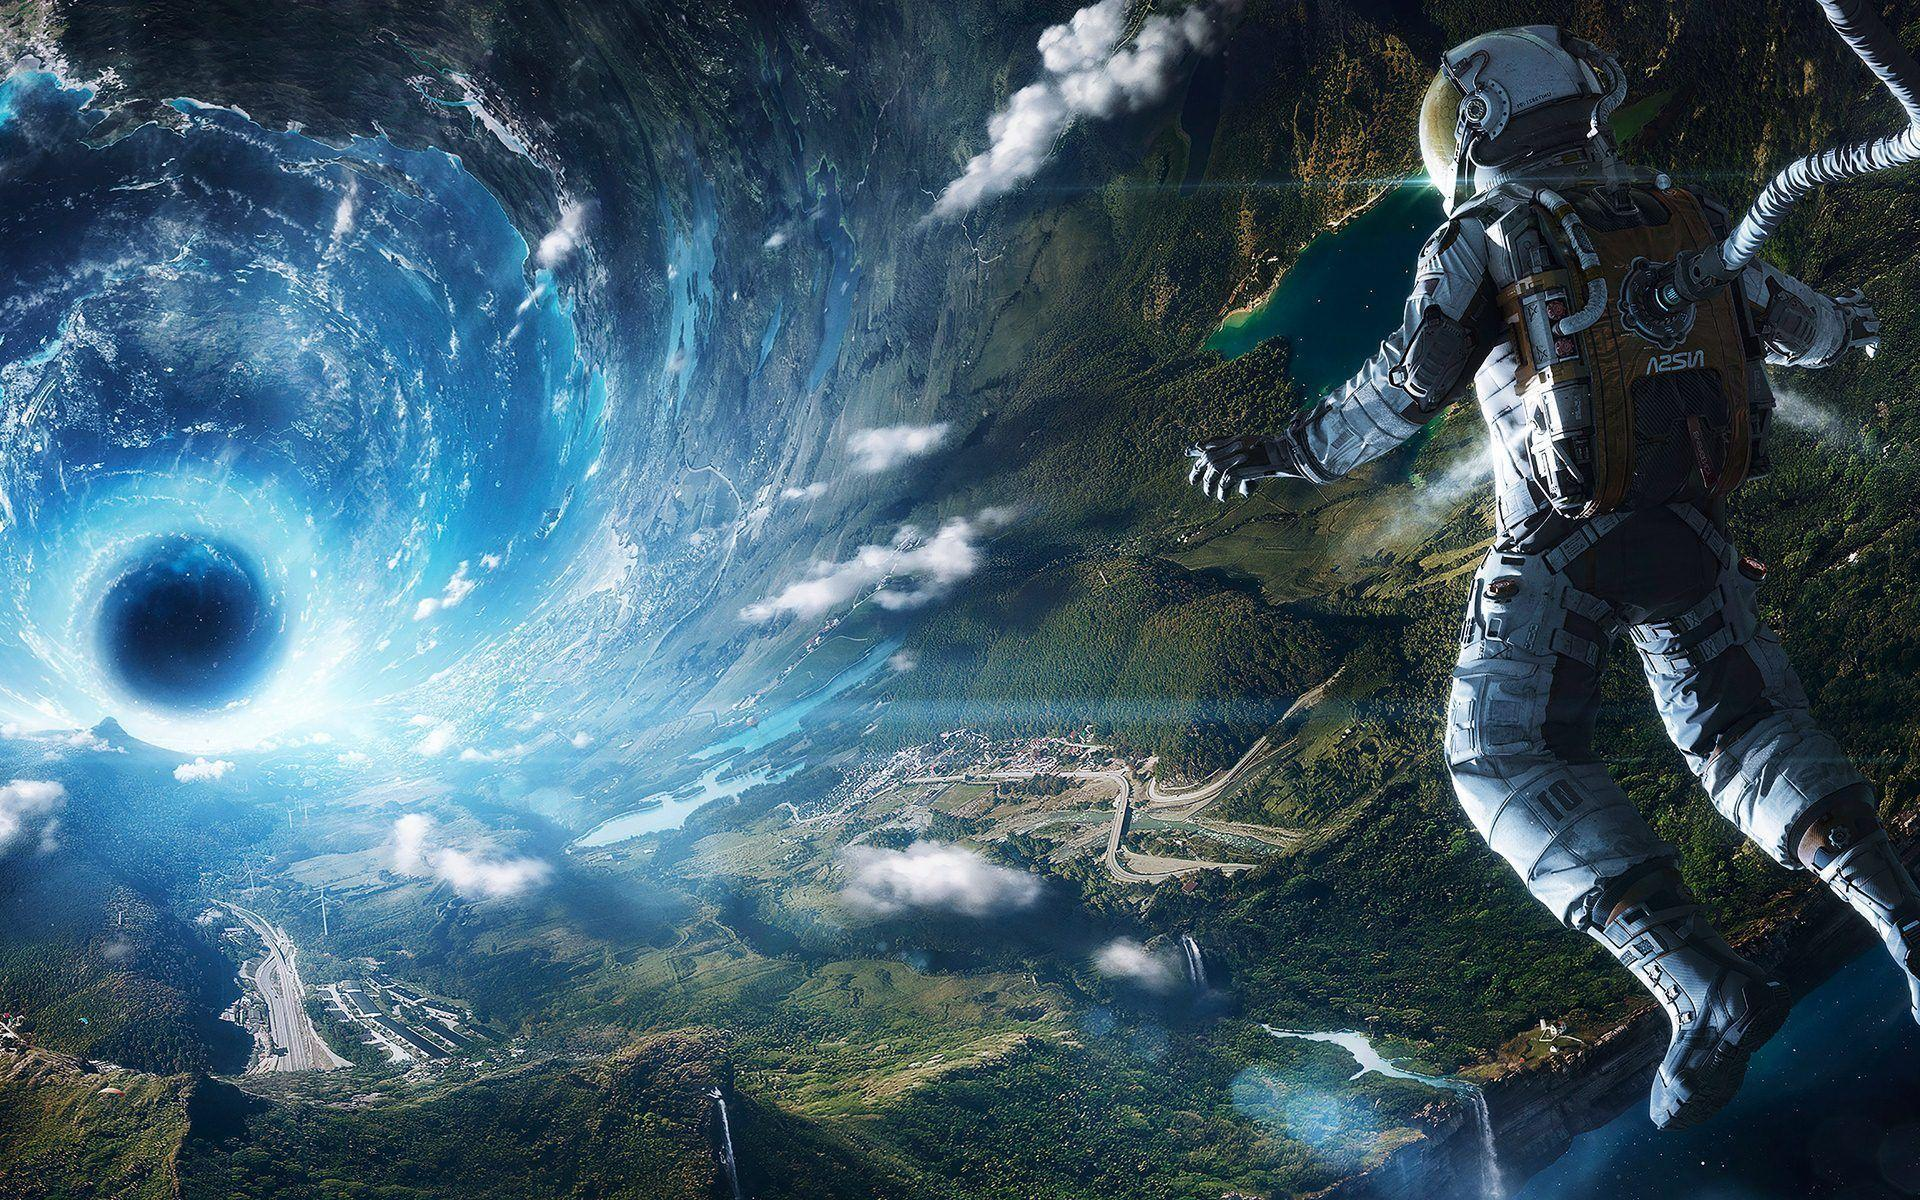 Hd Wallpaper Astronaut Sitting On Moon Wallpaper Astronaut